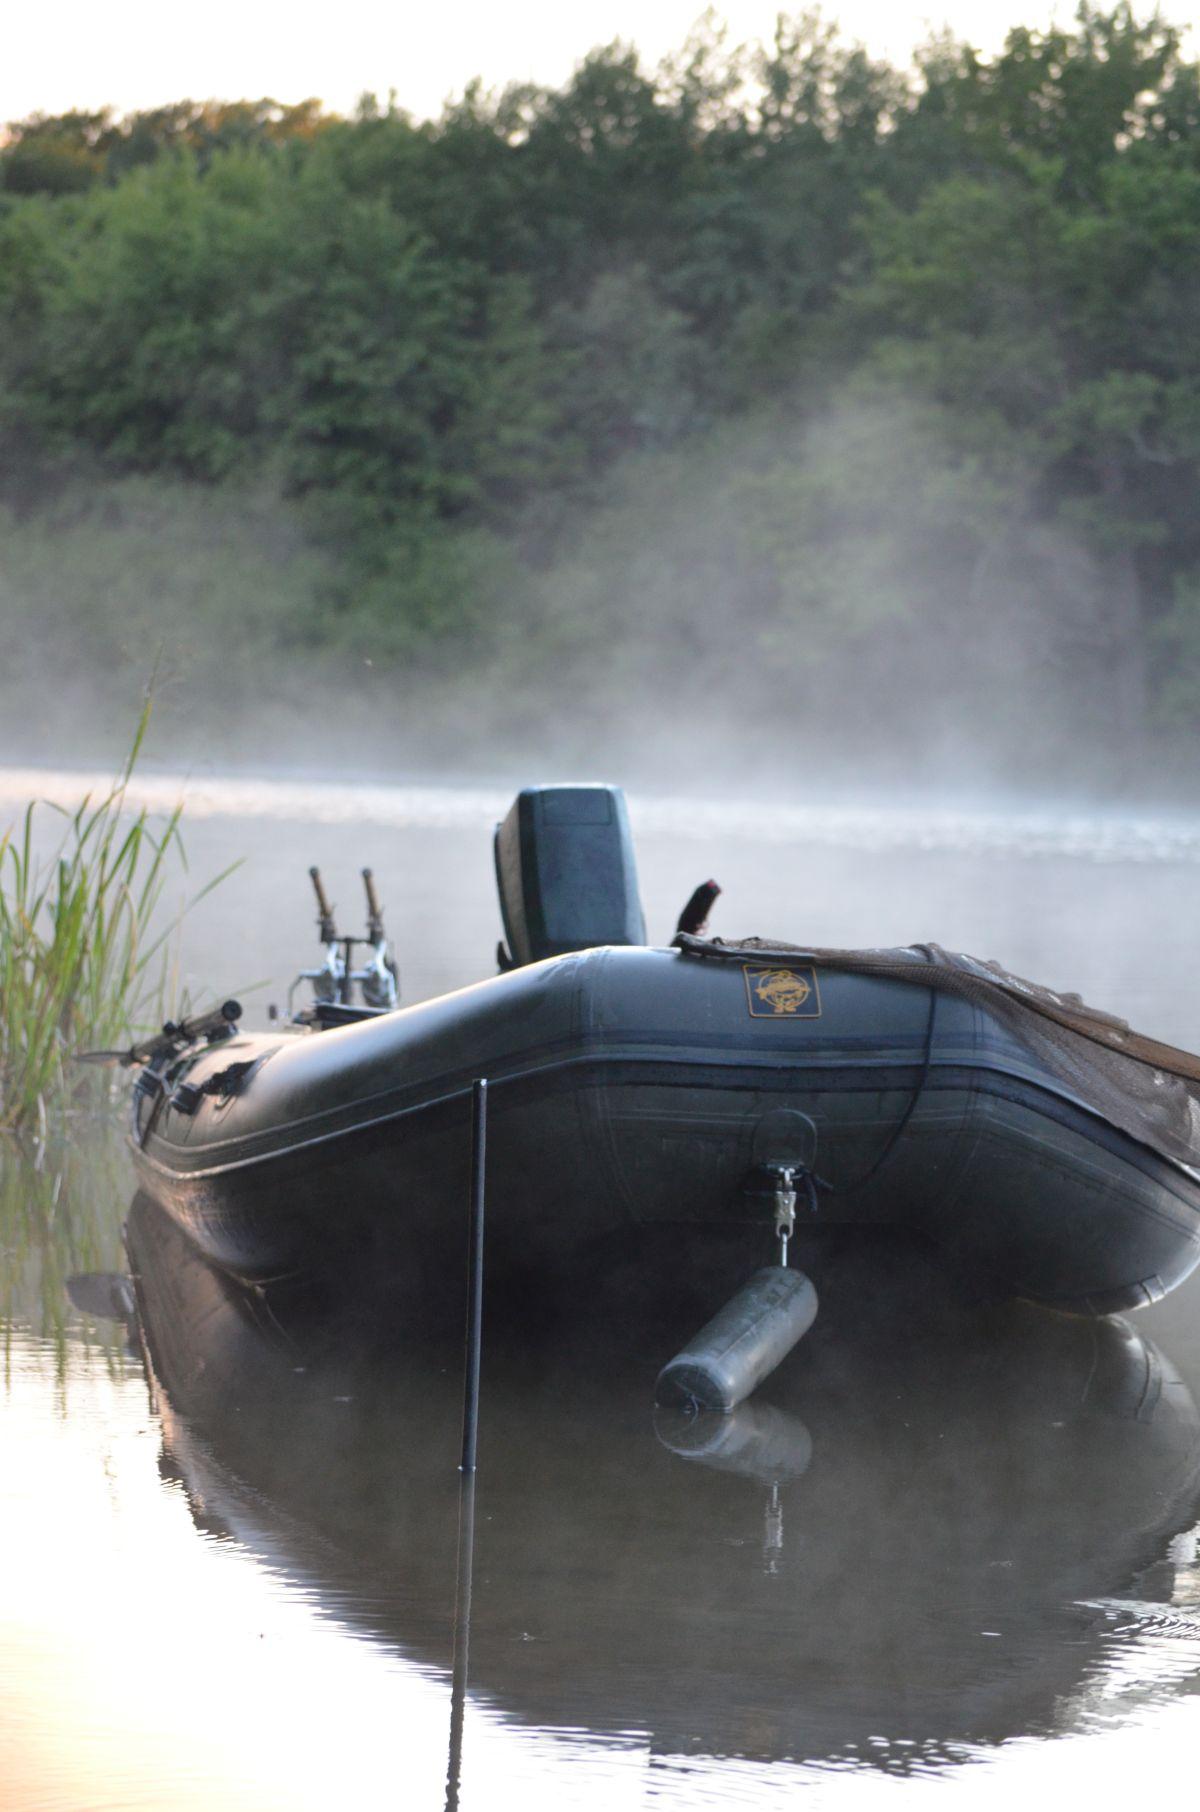 Philip Jakob, Imperial Fishing, Pech und Pannen